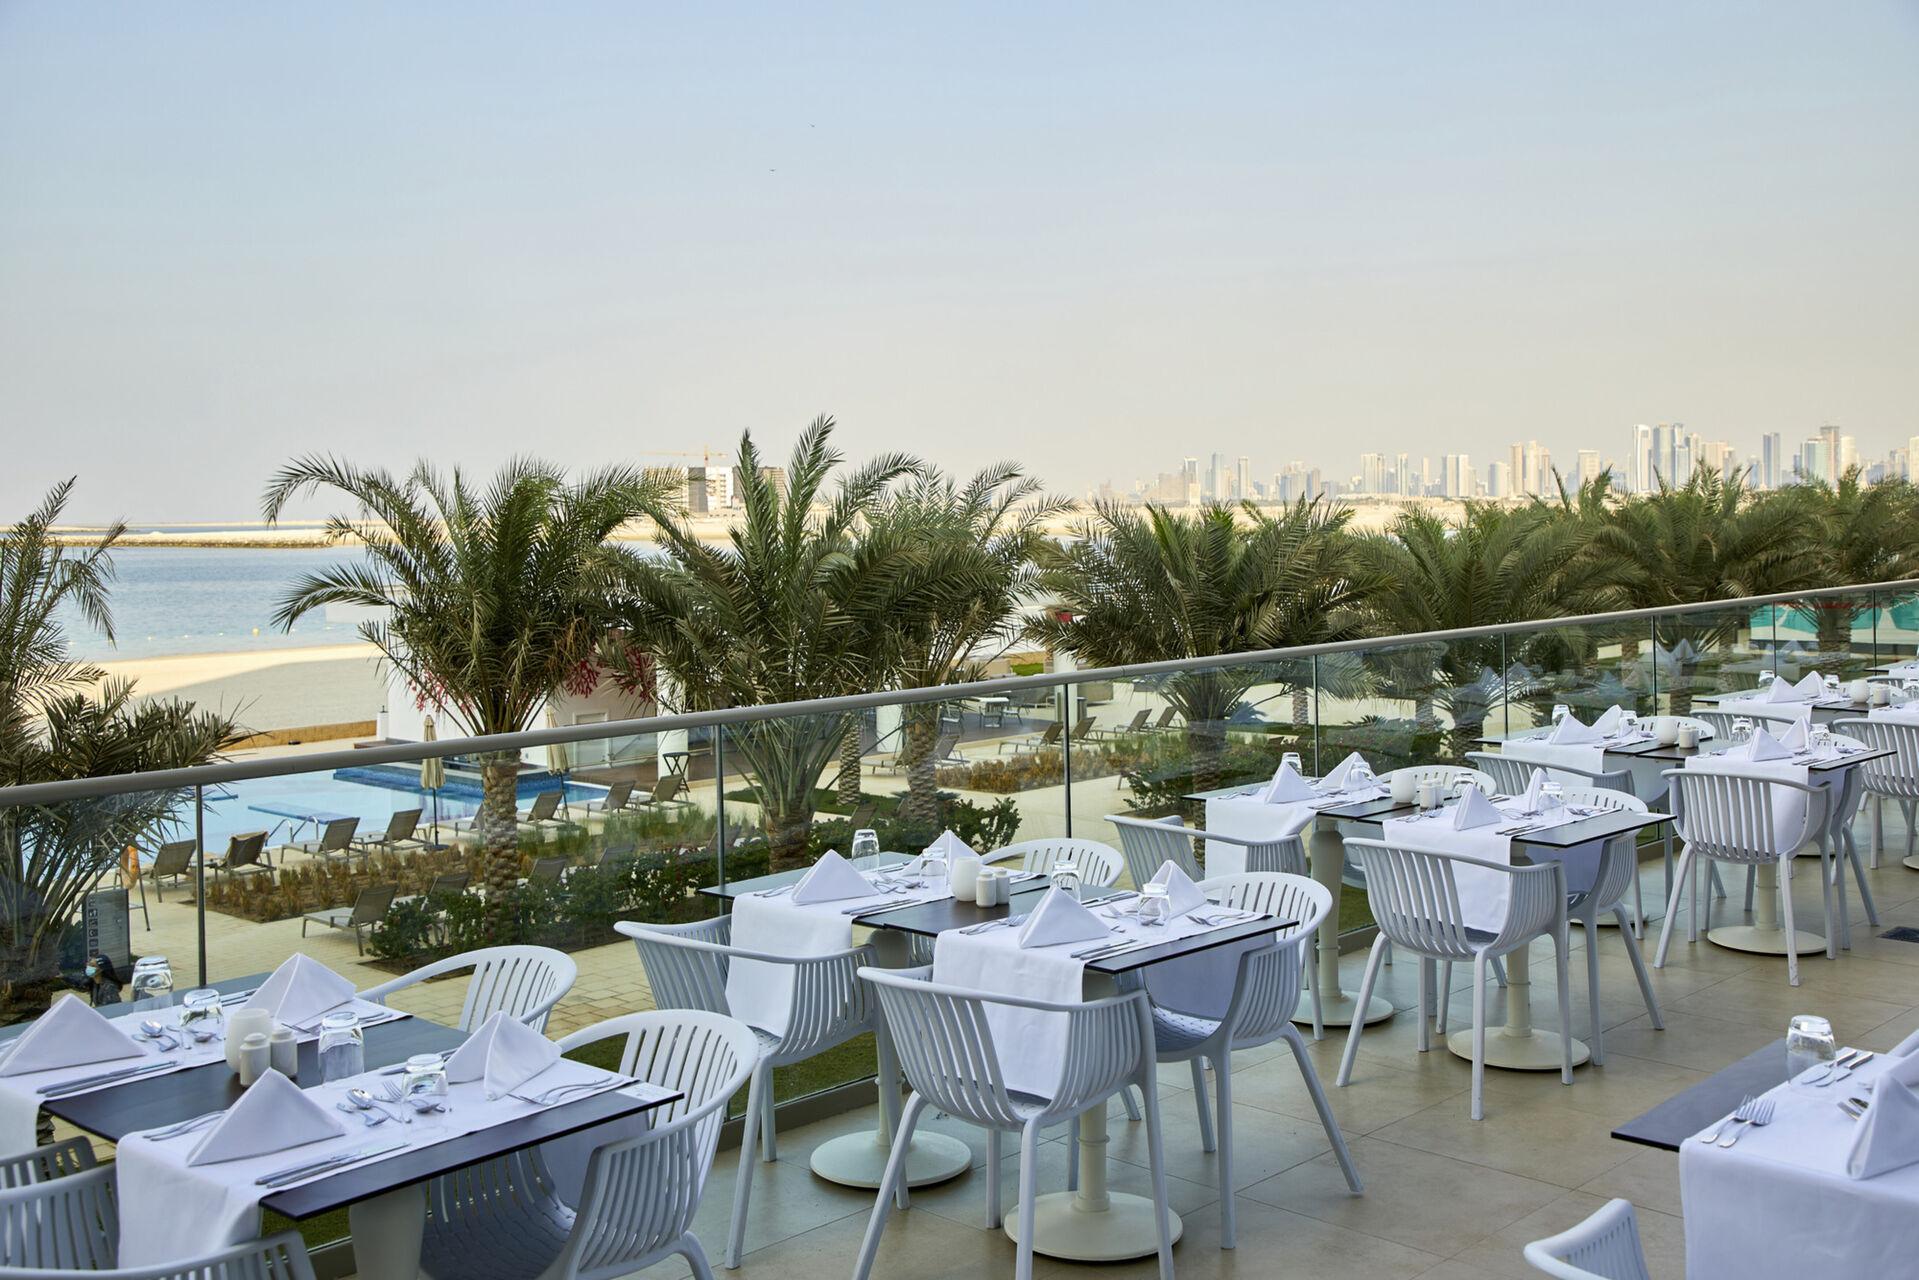 https://cms.satur.sk/data/imgs/tour_image/orig/dub_20_074-main-restaurant-terrace-1939871.jpg